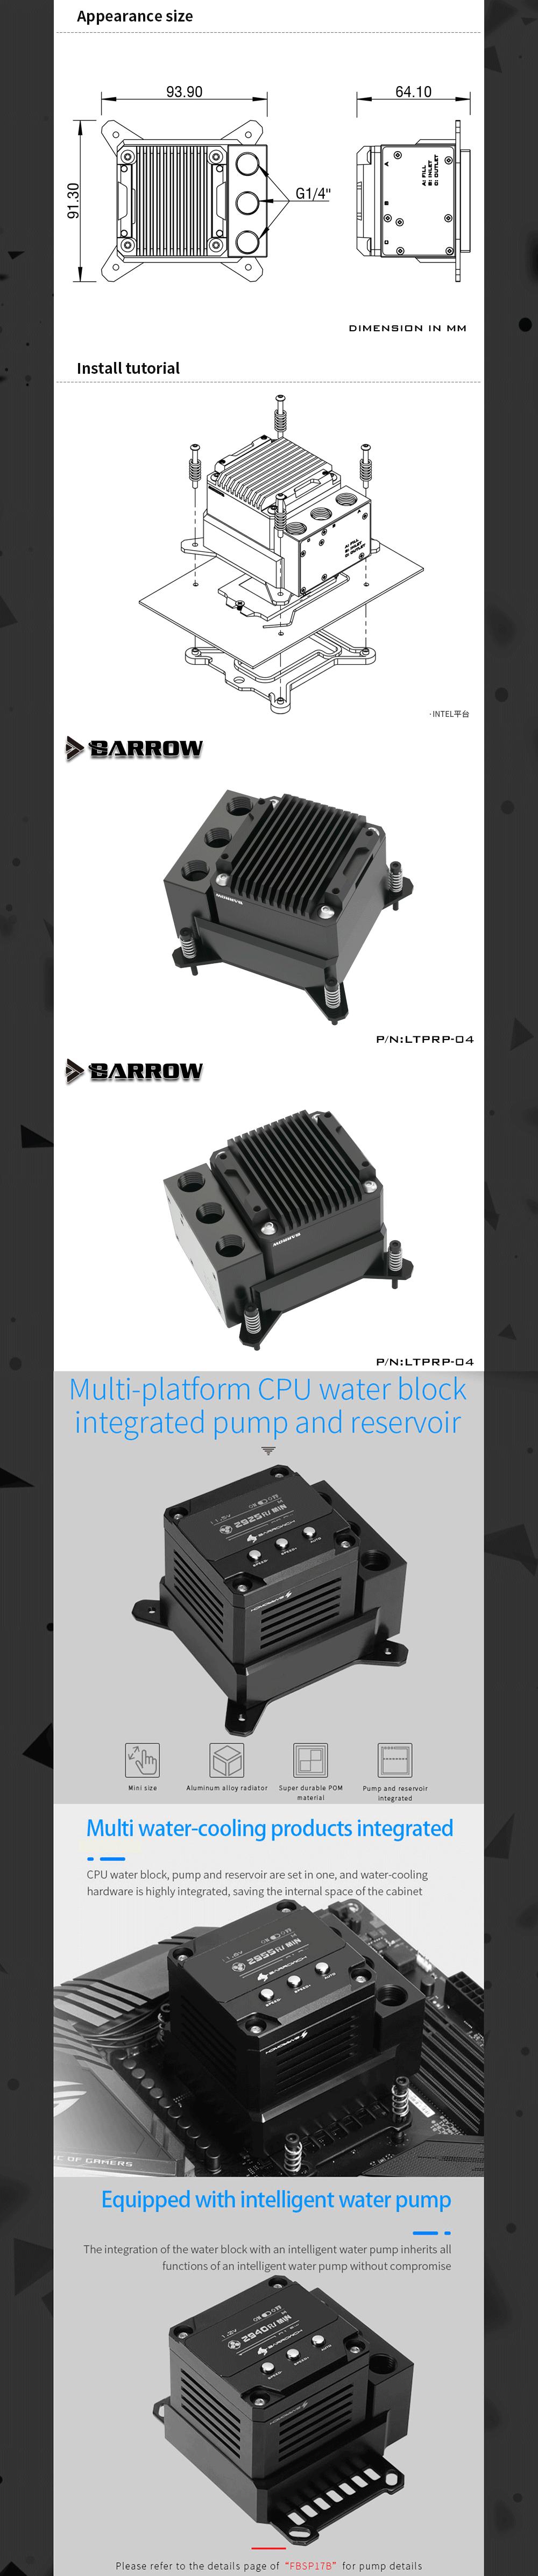 Barrowch POM CPU Block Pump Reservoir 17W PWM Intelligent Pump Three In One OLED Digital Display, LTPRP-04/FBLTPRP-04